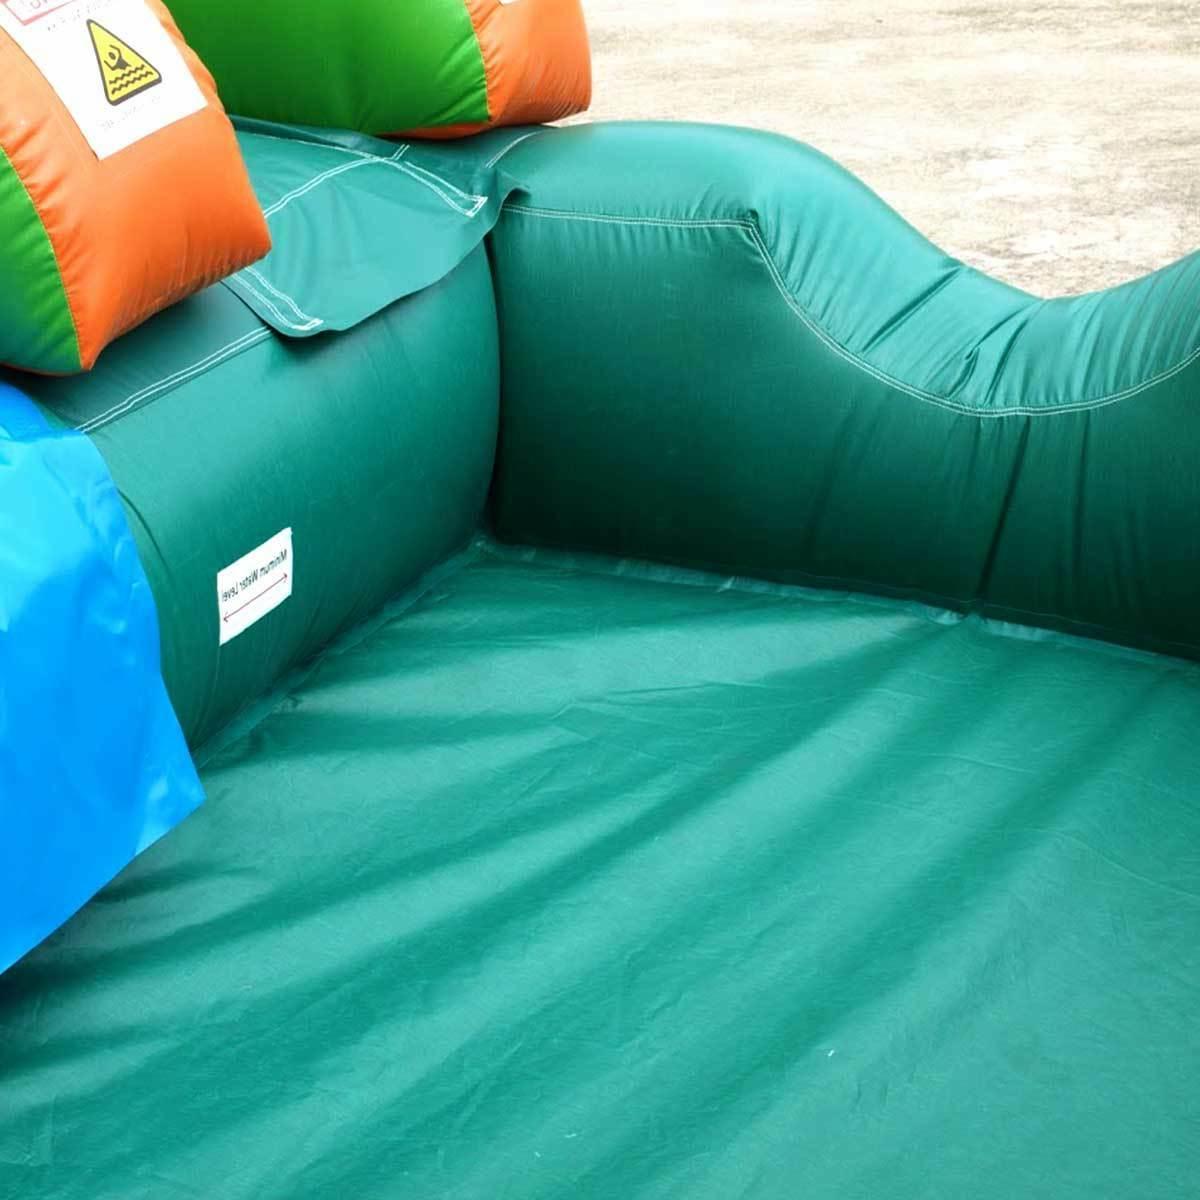 Inflatable Tropical Island Water Slide Pool Blower